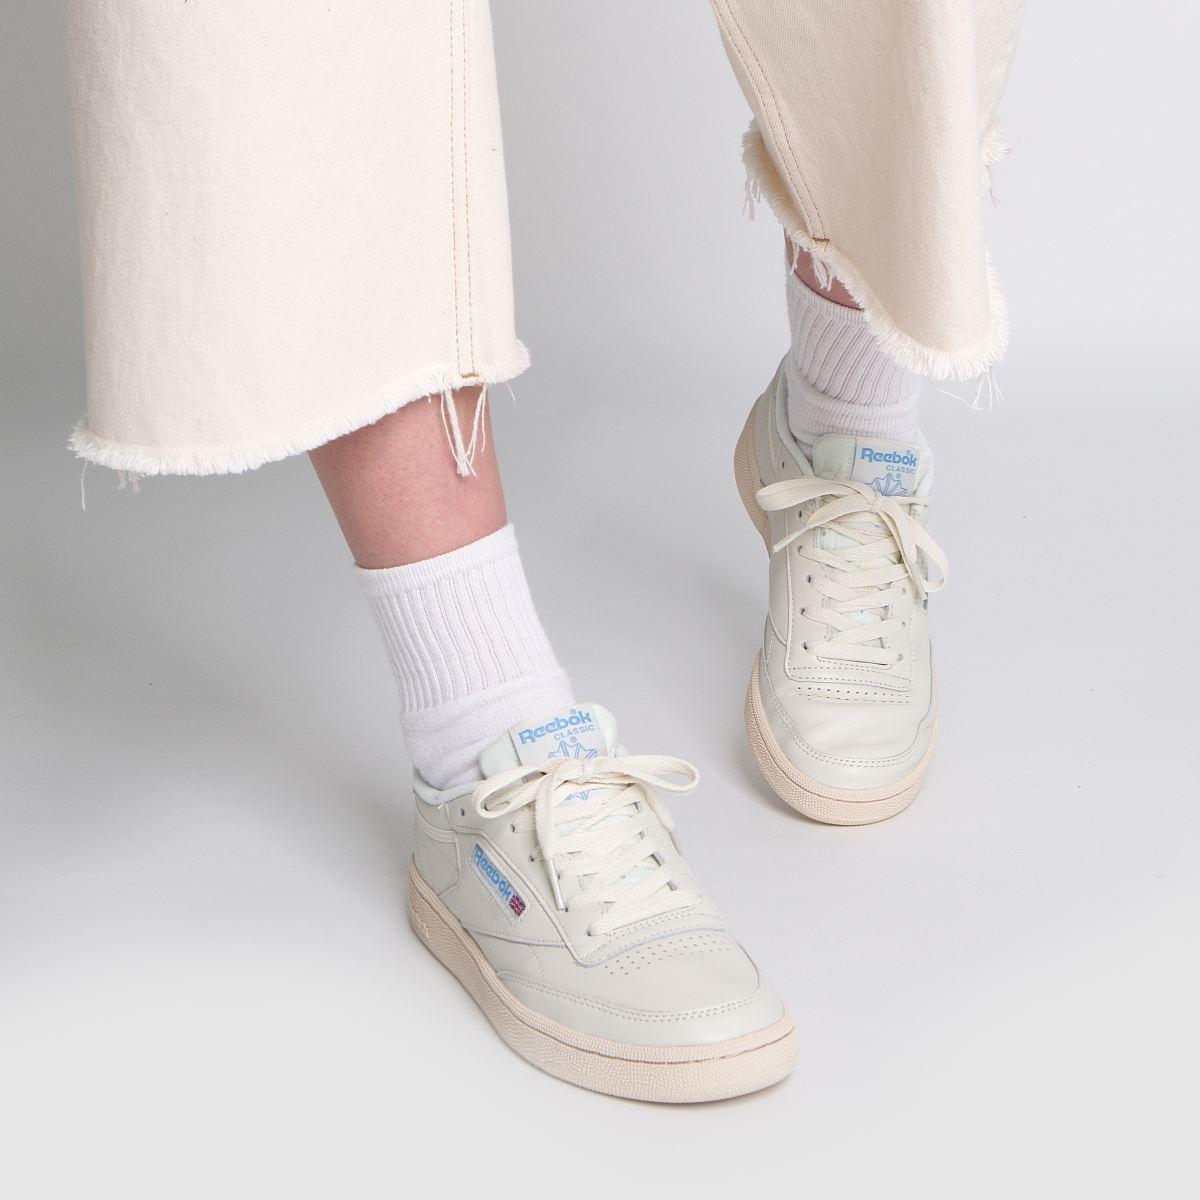 Damen Steingrau Sneaker reebok Club C Vintage Sneaker Steingrau   schuh Gute Qualität beliebte Schuhe c39d57